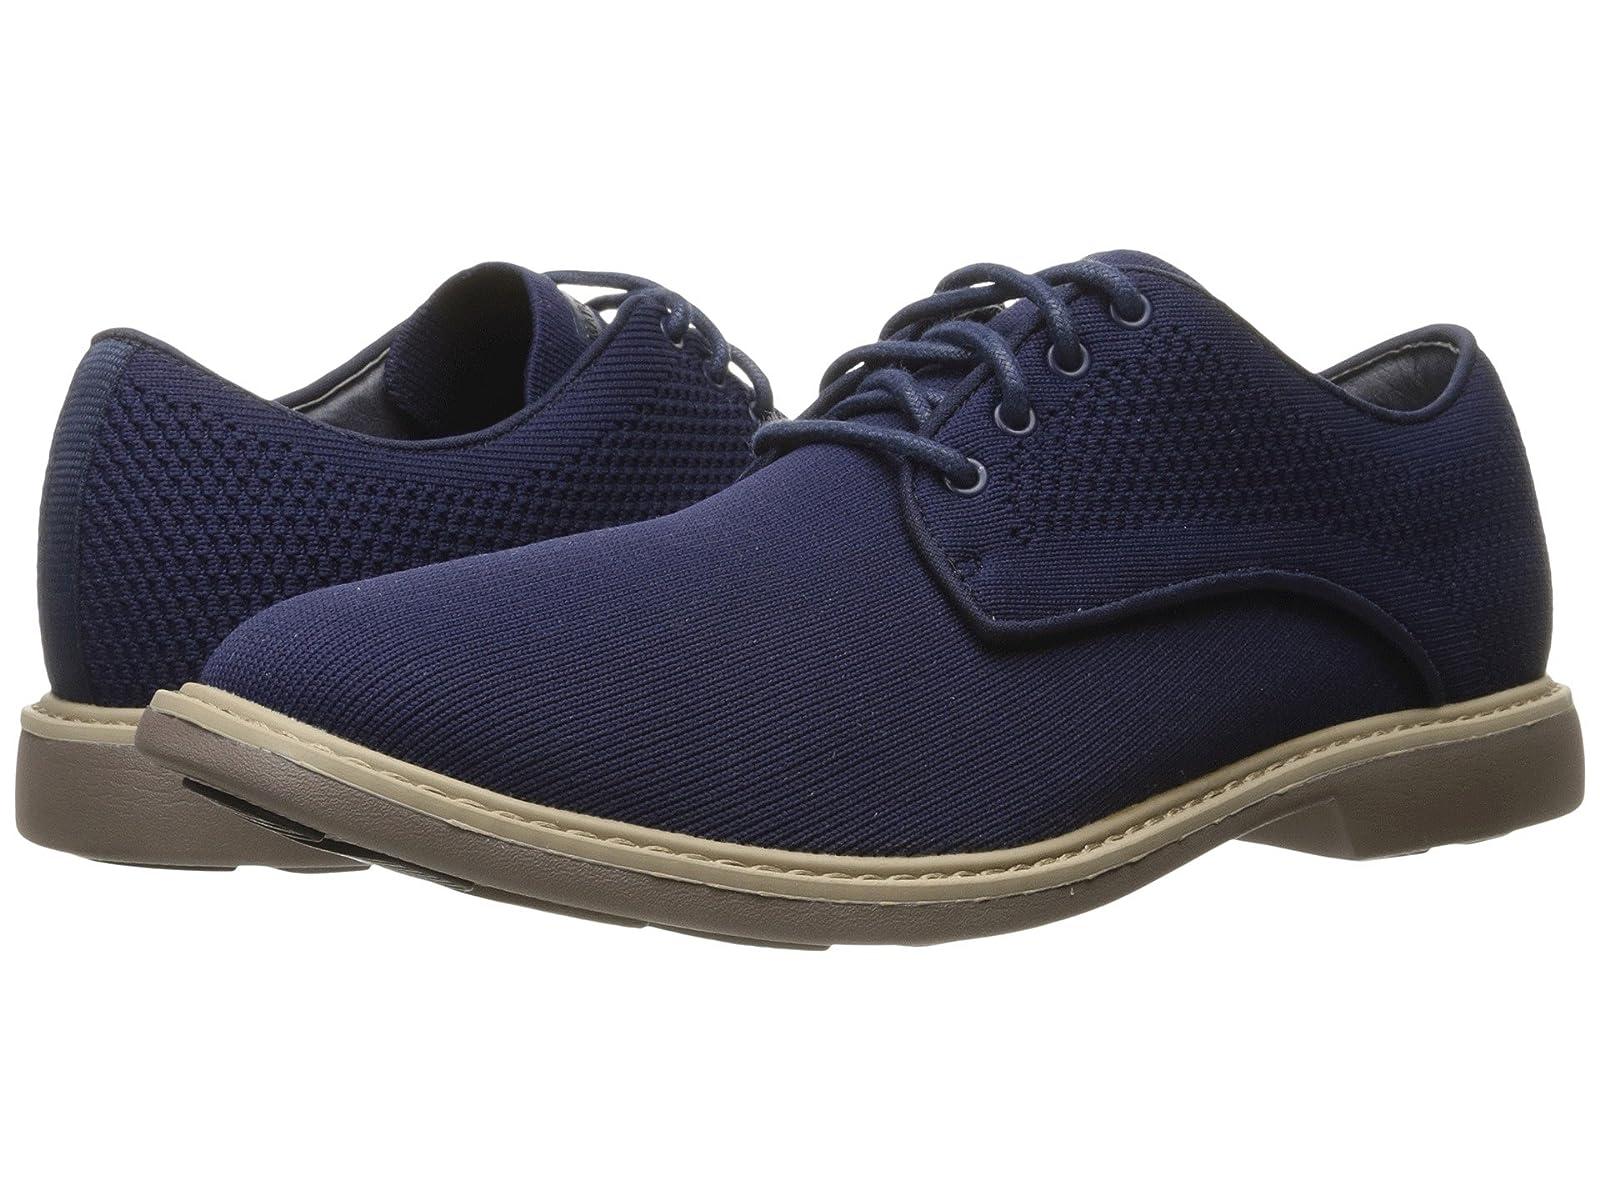 Mark Nason MaasCheap and distinctive eye-catching shoes